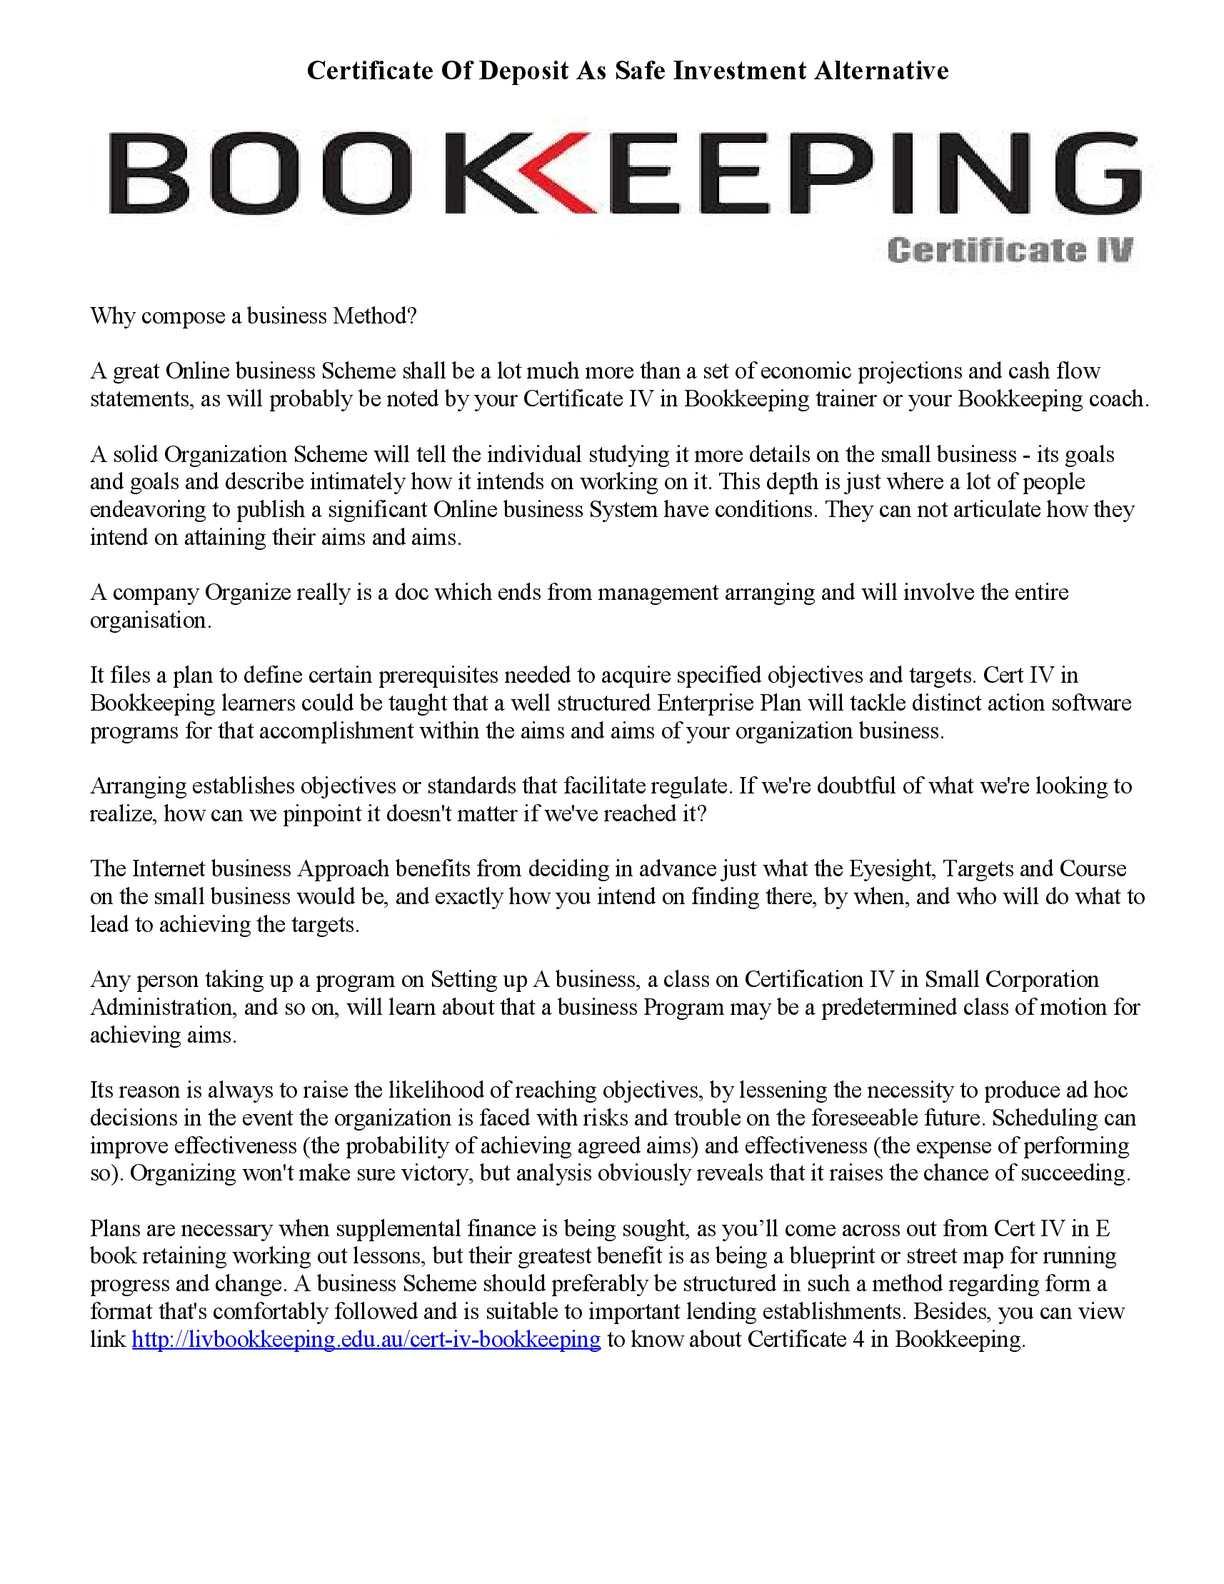 Calamo Certificate 4 In Bookkeeping